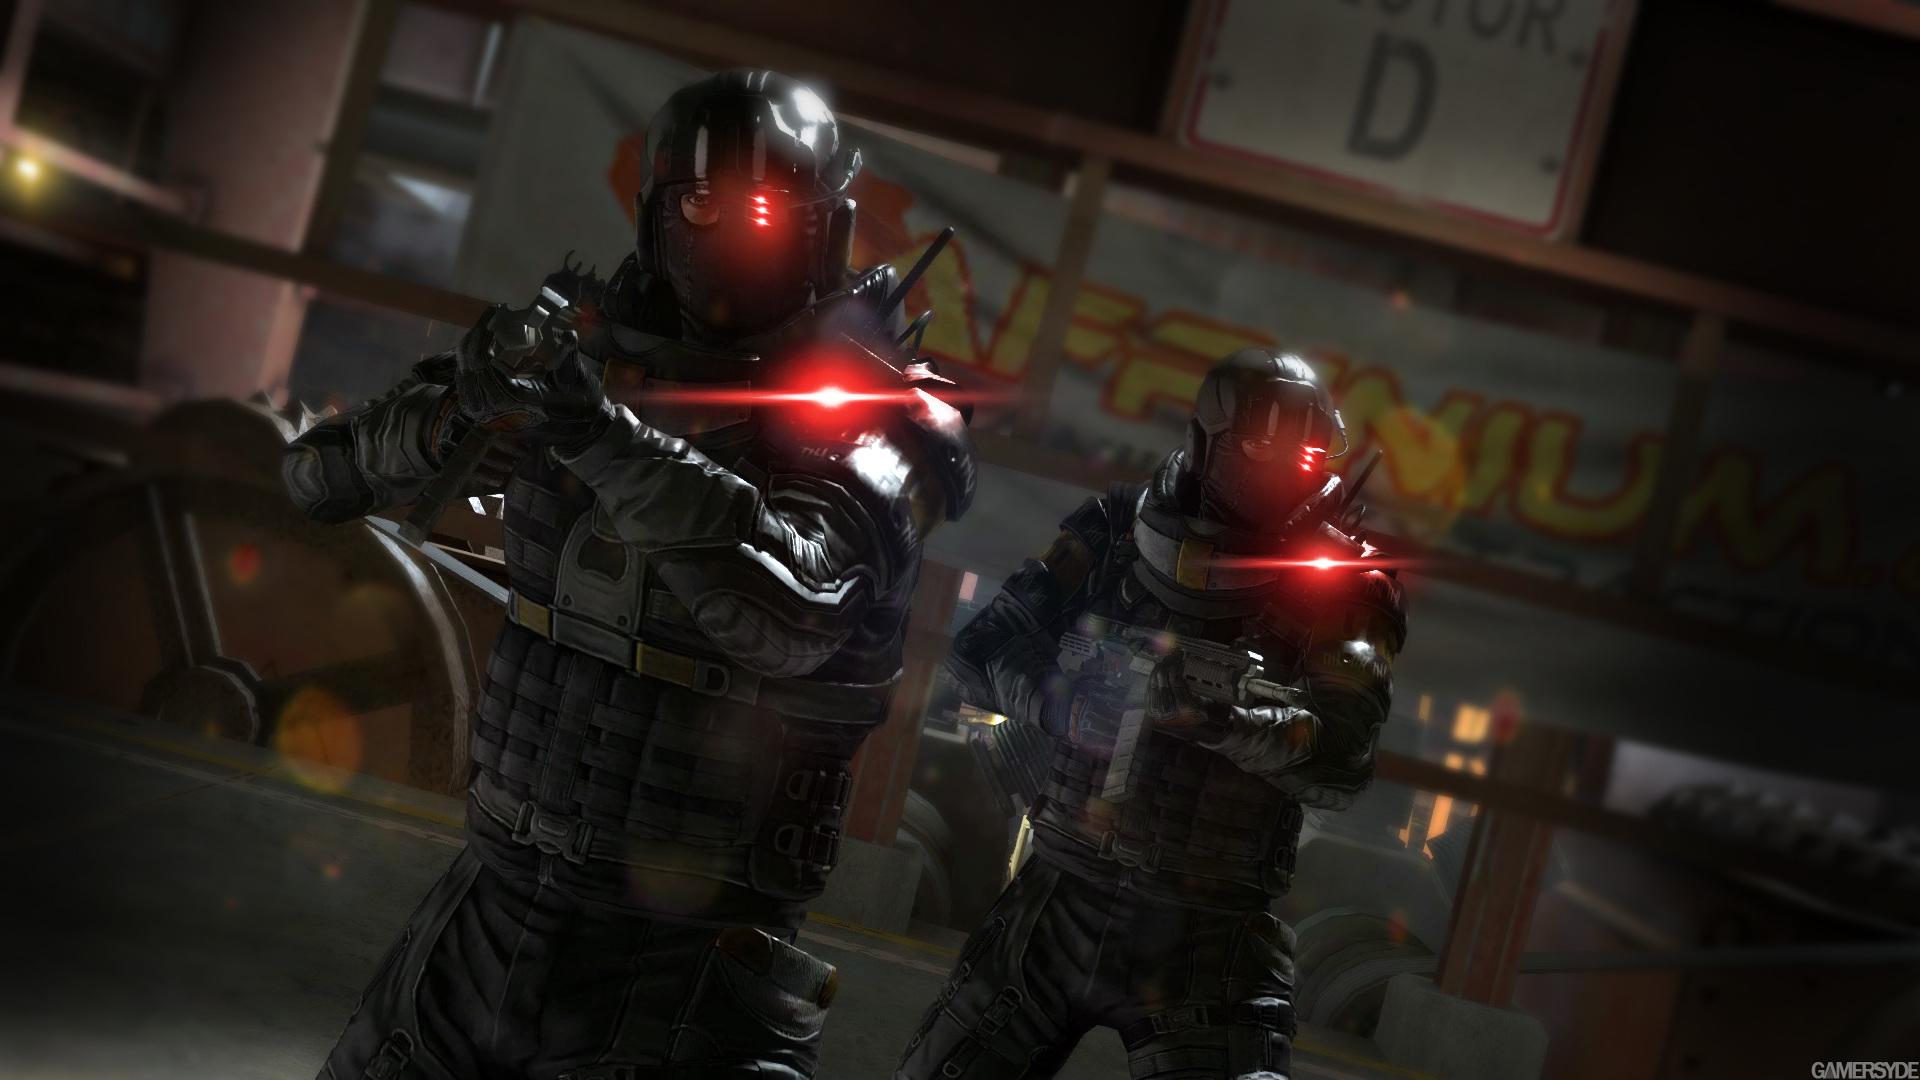 image tom clancy s splinter cell blacklist 22412 2521 0003 با تصاویر جدید Splinter Cell: Blacklist همراه باشید